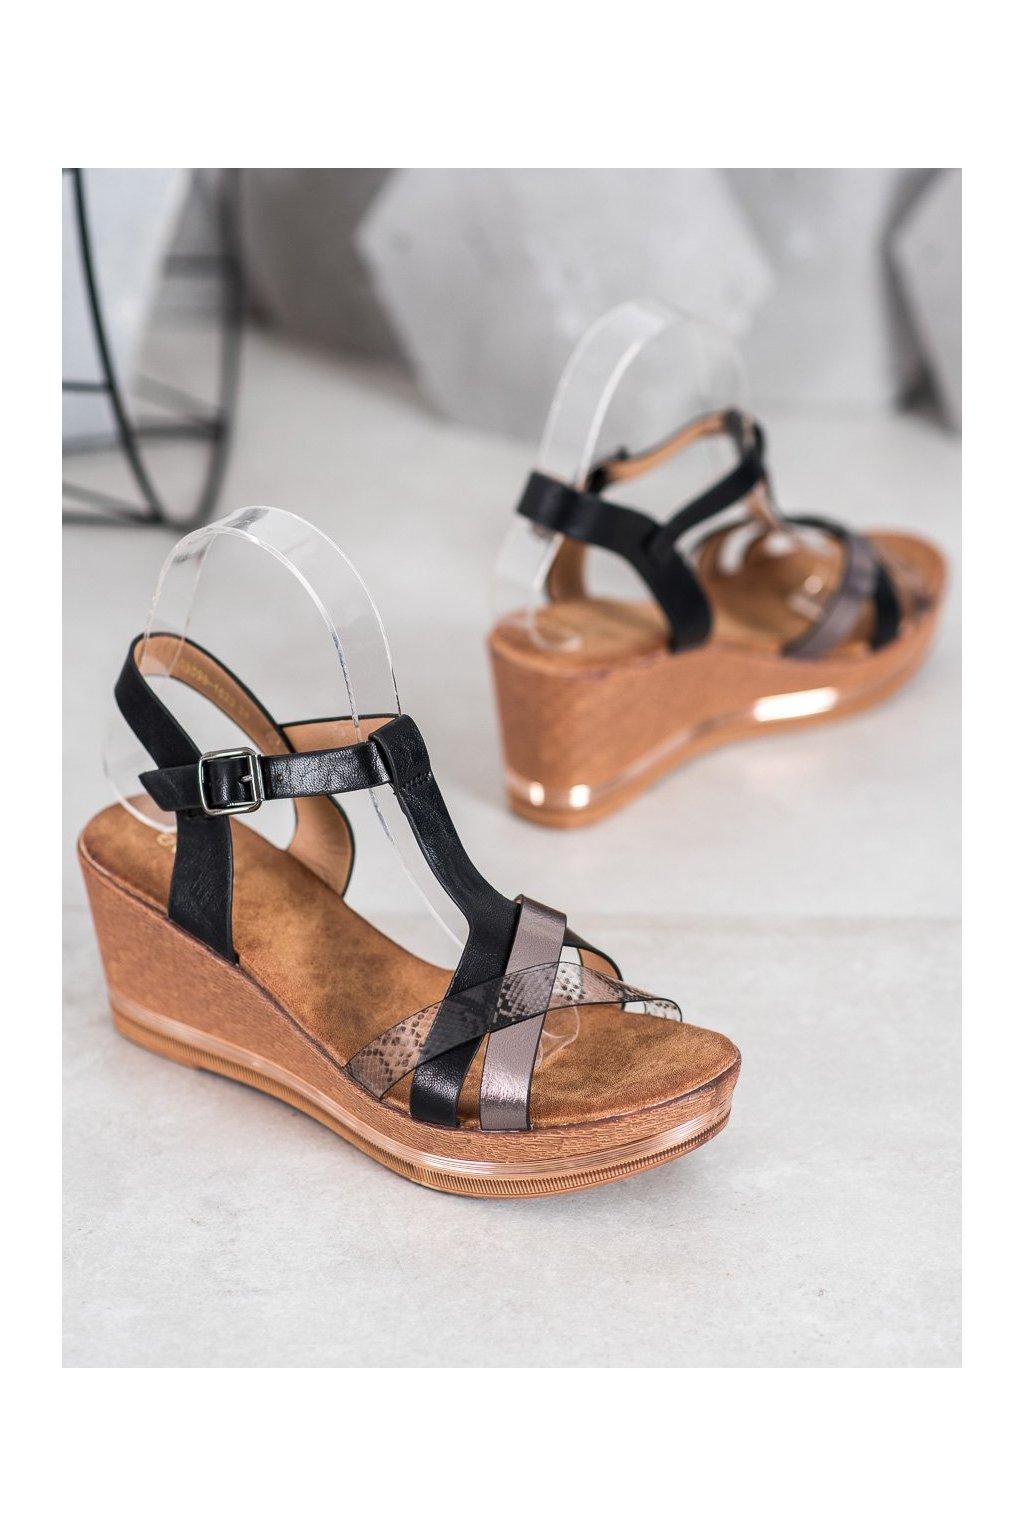 Čierne sandále Evento NJSK 20SD98-1620B